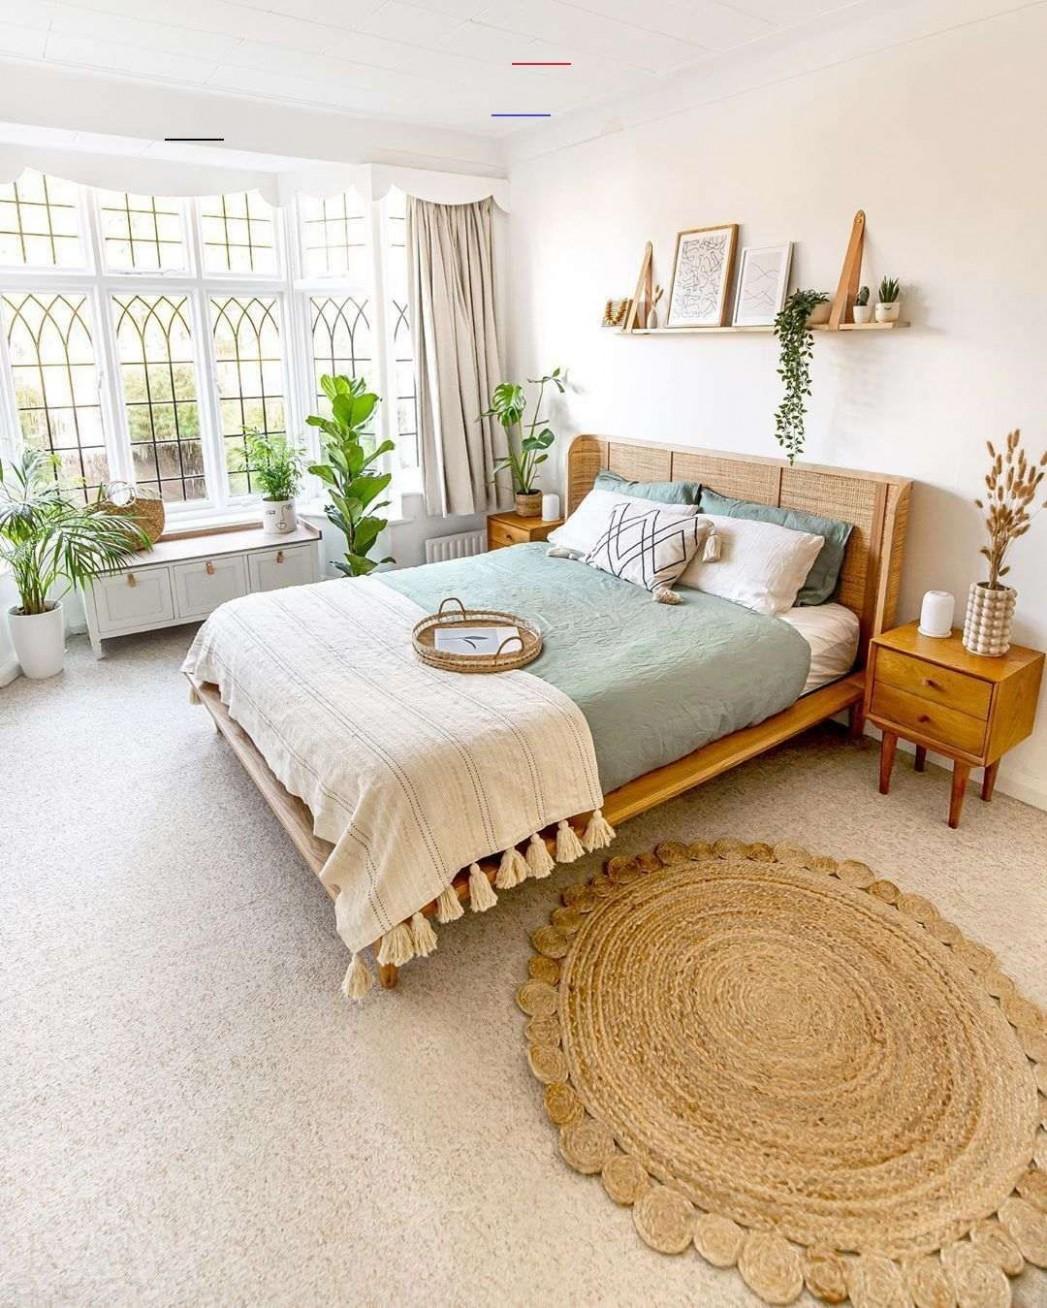 decorationentrance in 8  Bedroom interior, Bedroom makeover  - Bedroom Ideas Kenya